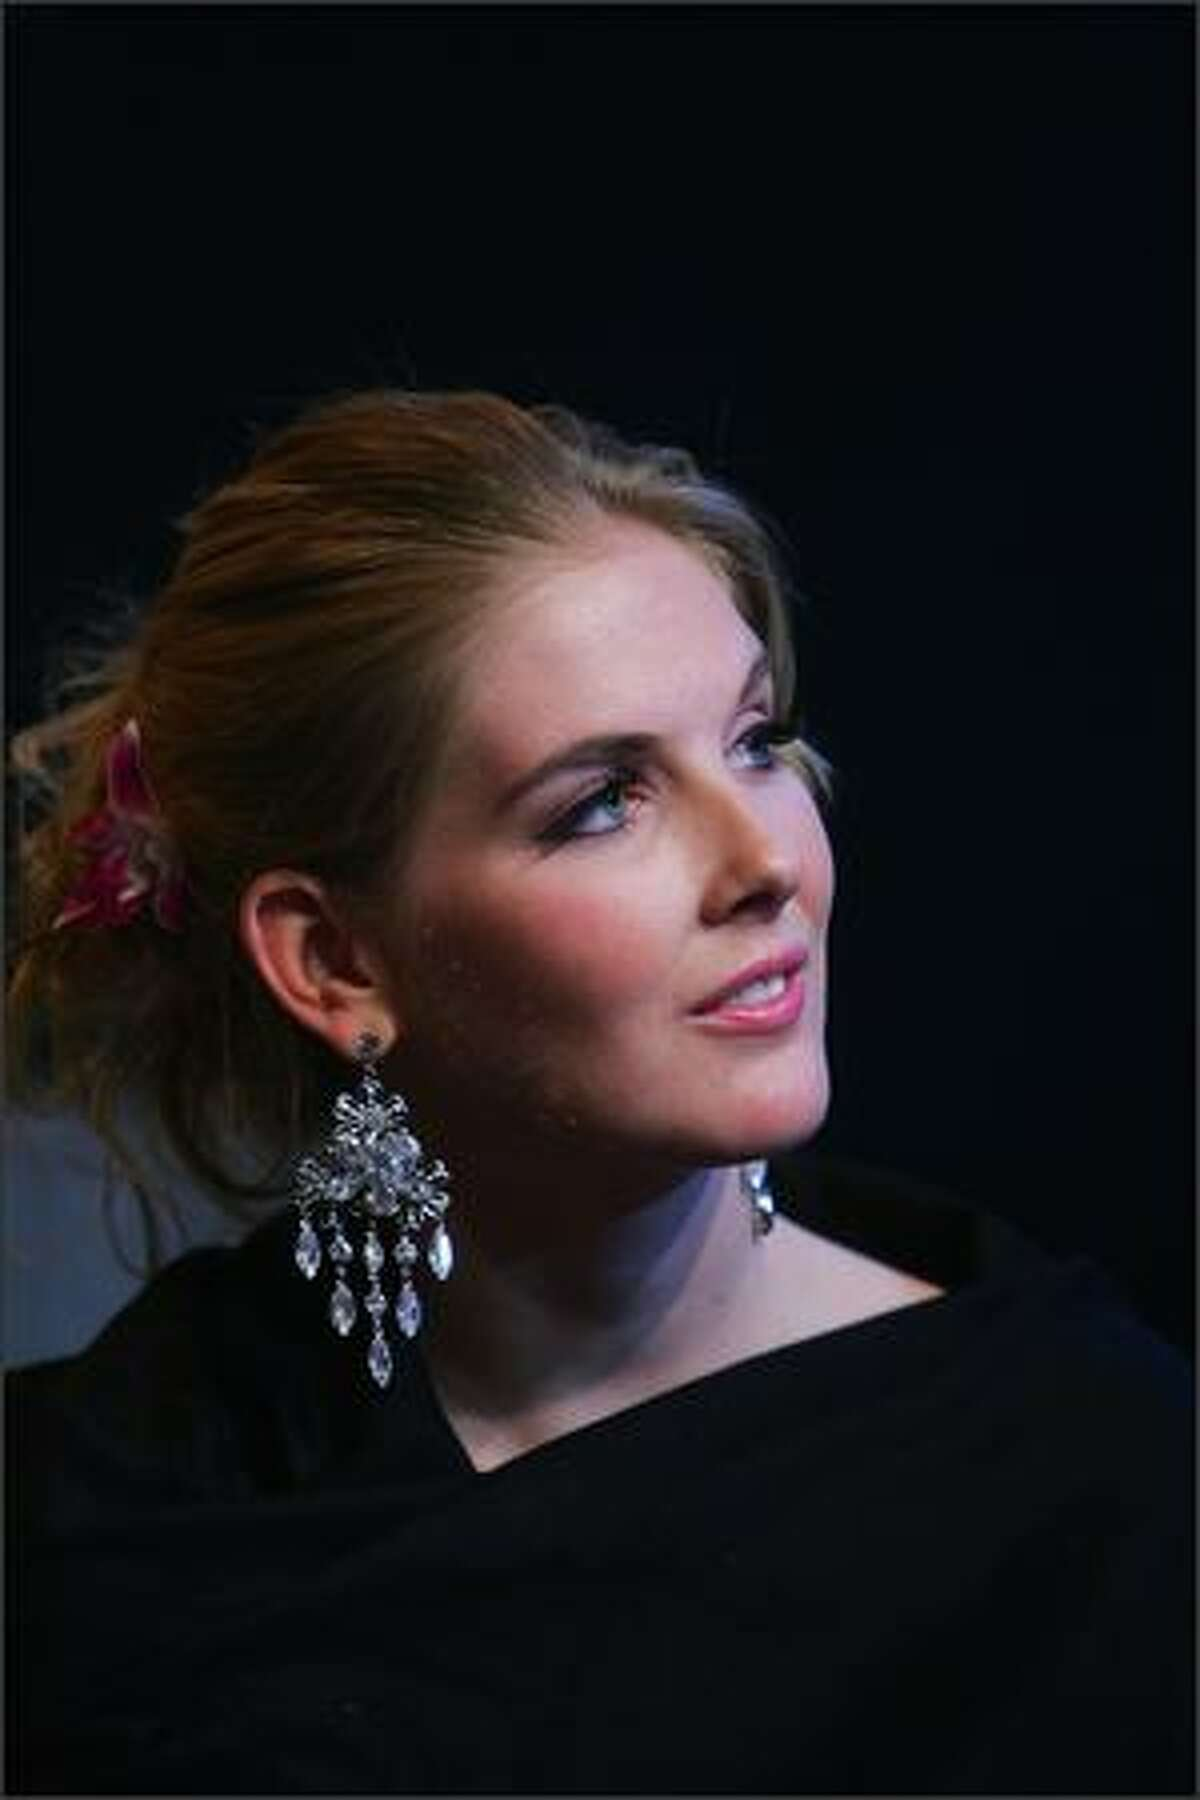 Caroline Pemberton, Miss Australia 2007, looks on in a TV studio on Nov. 20 in Beijing.